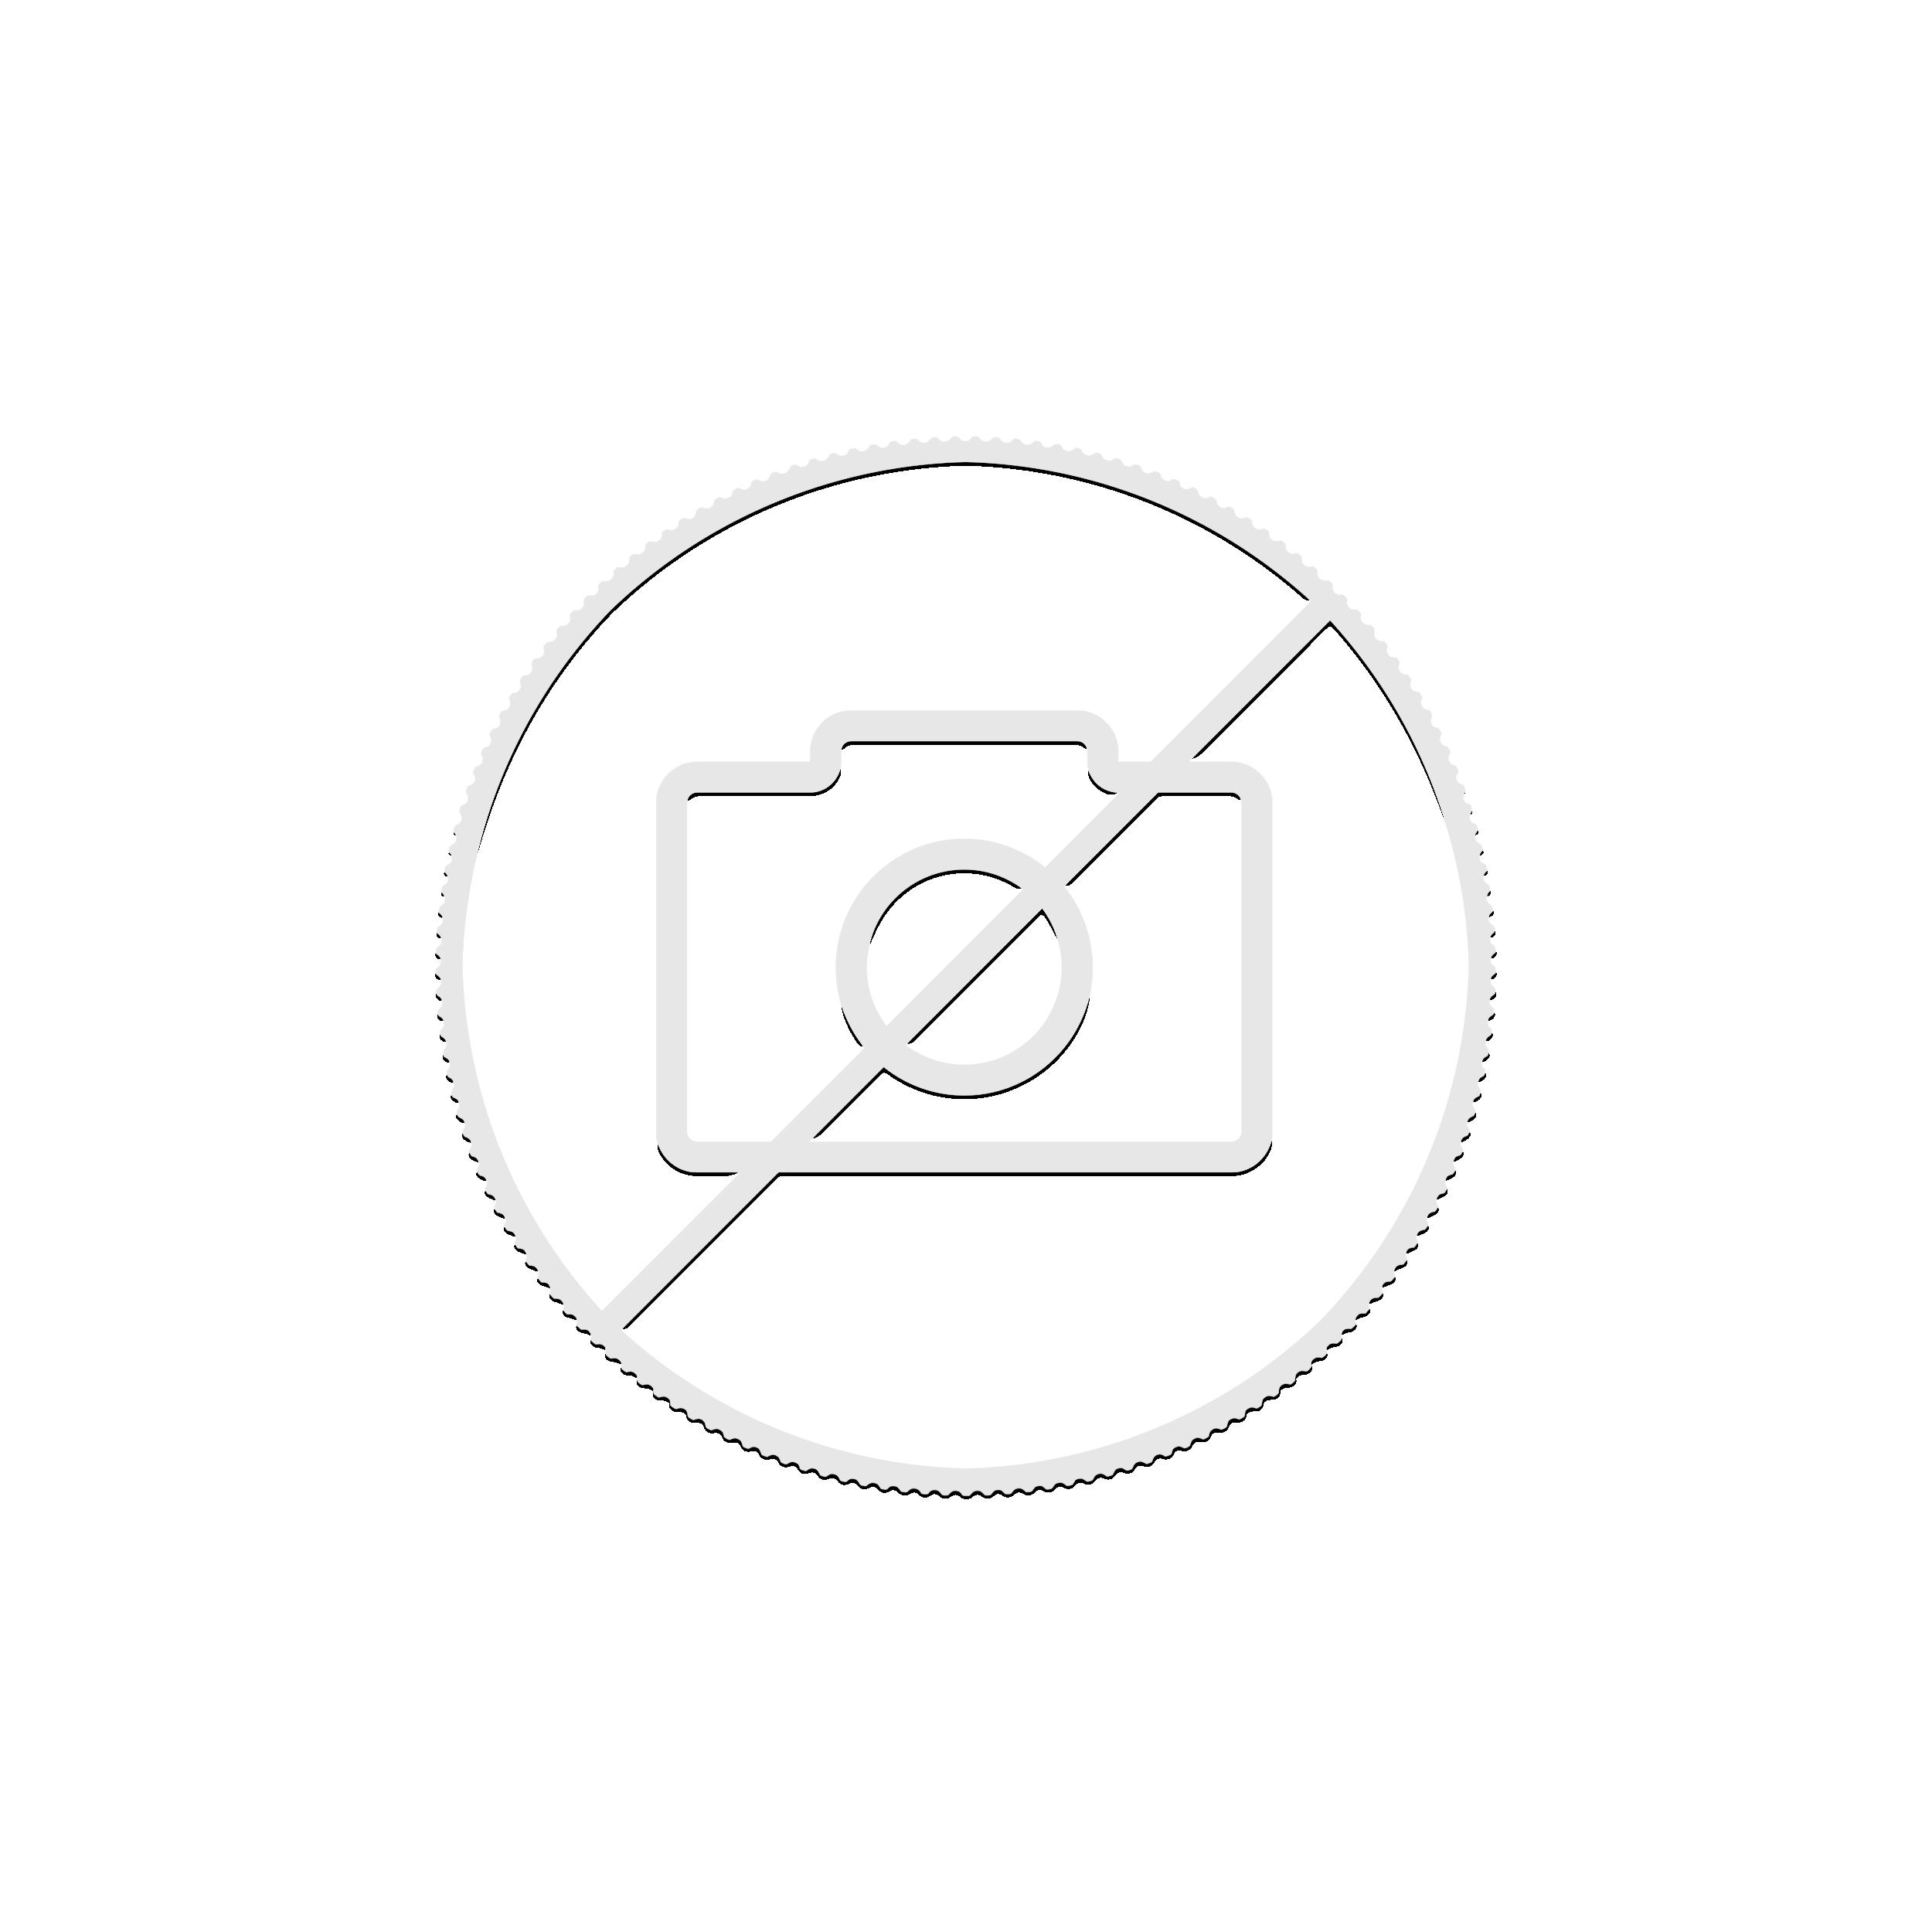 40 Frank gouden munt Frankrijk